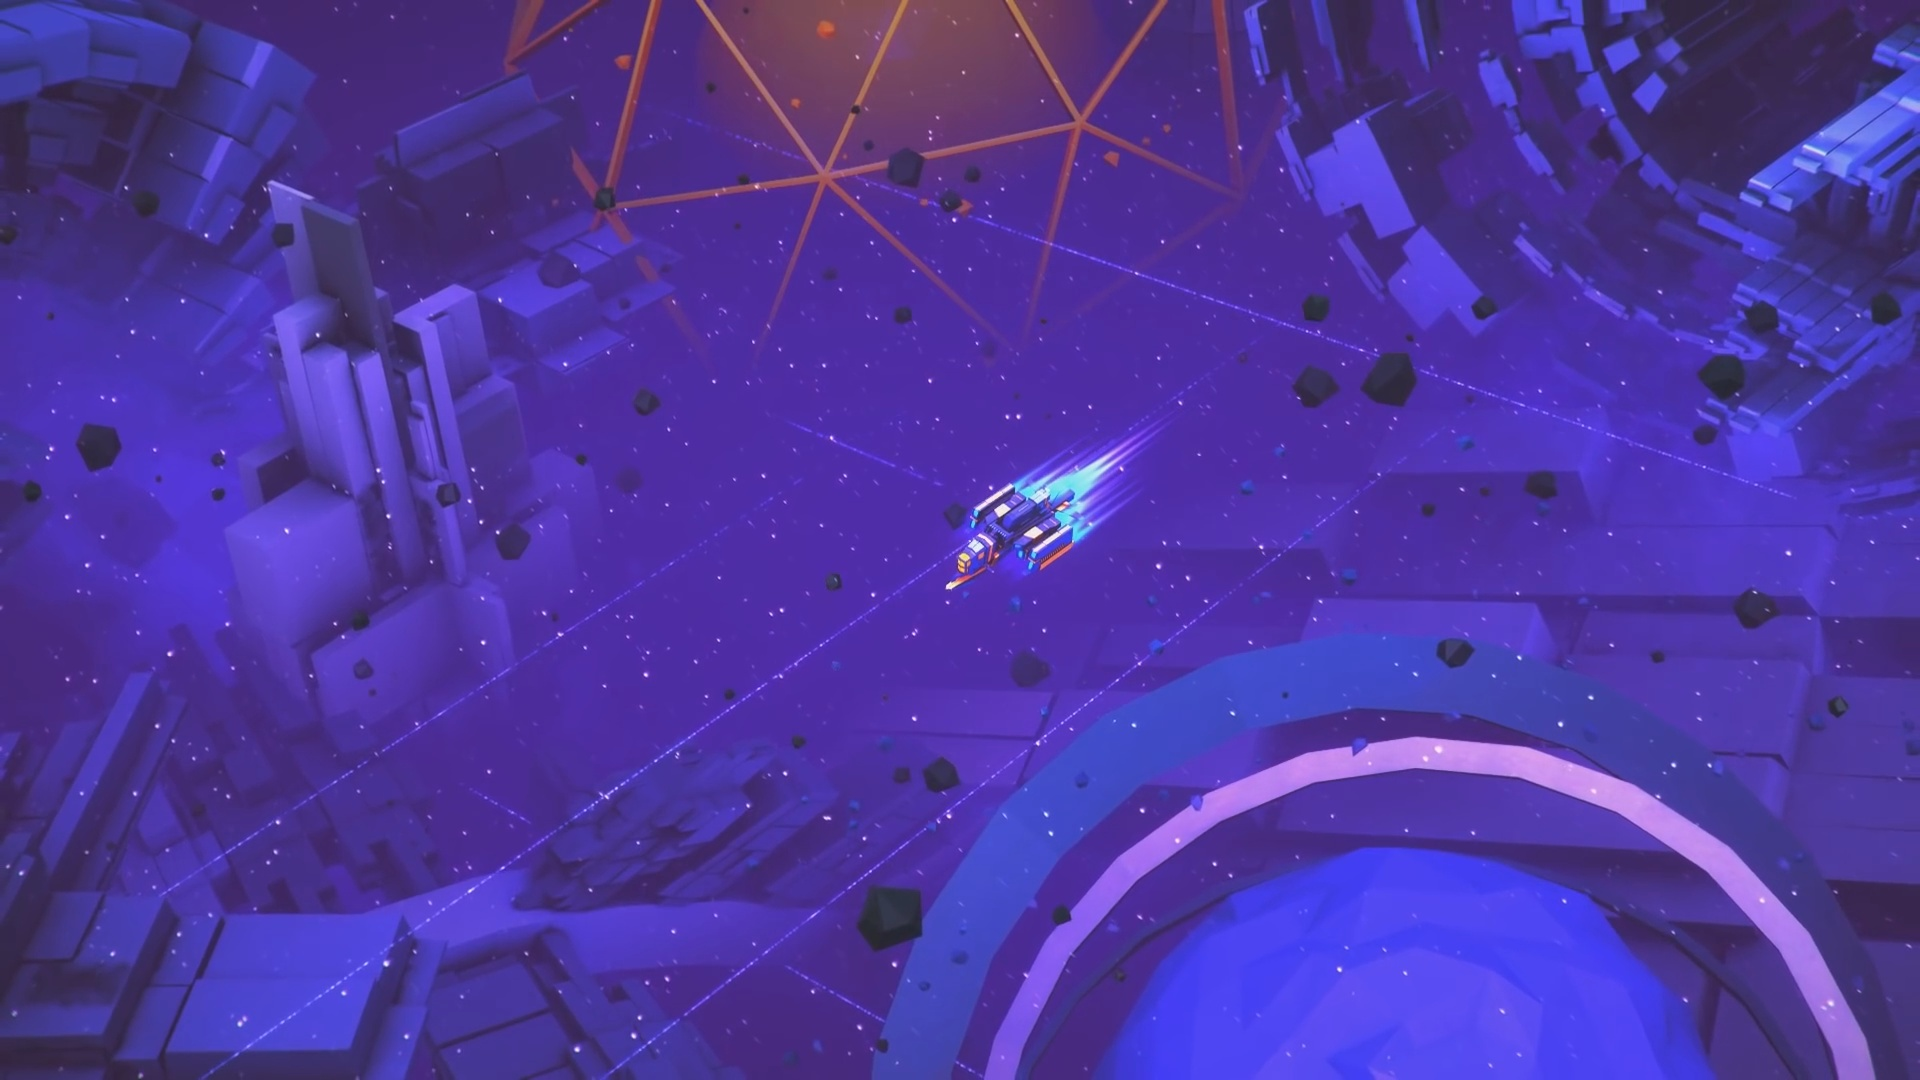 Space Odyssey screenshot